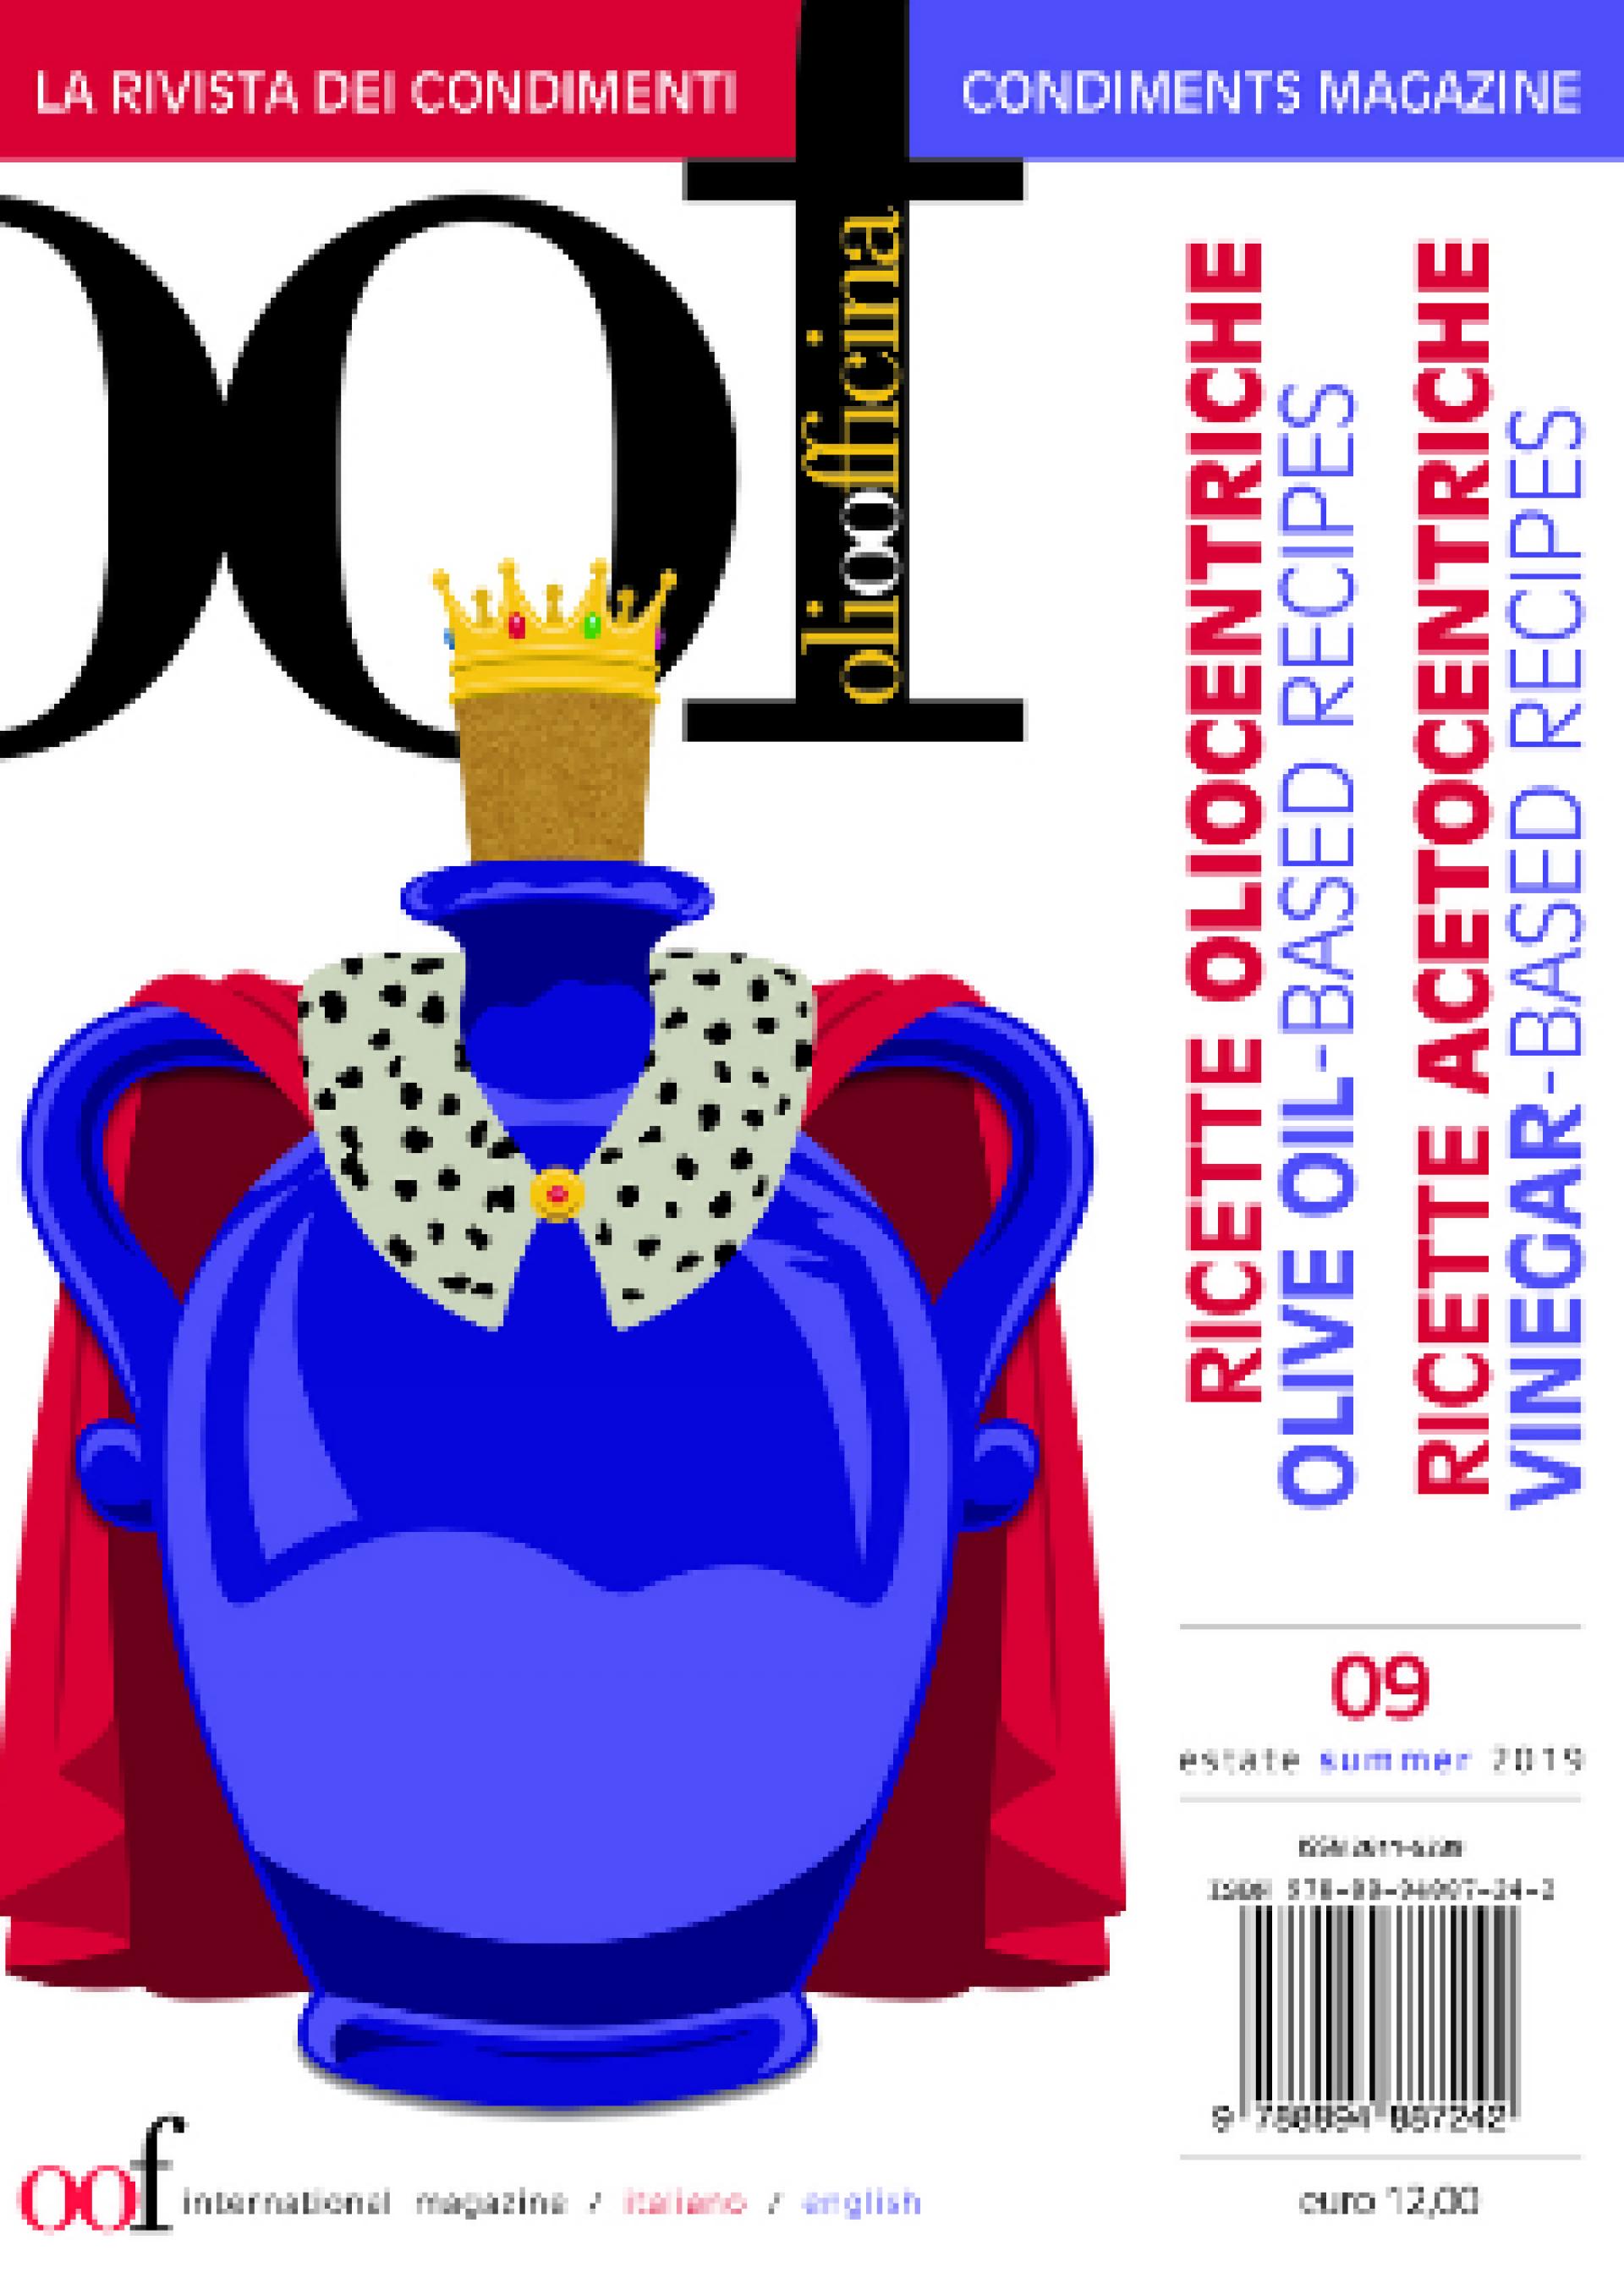 OOF International Magazine numero 9